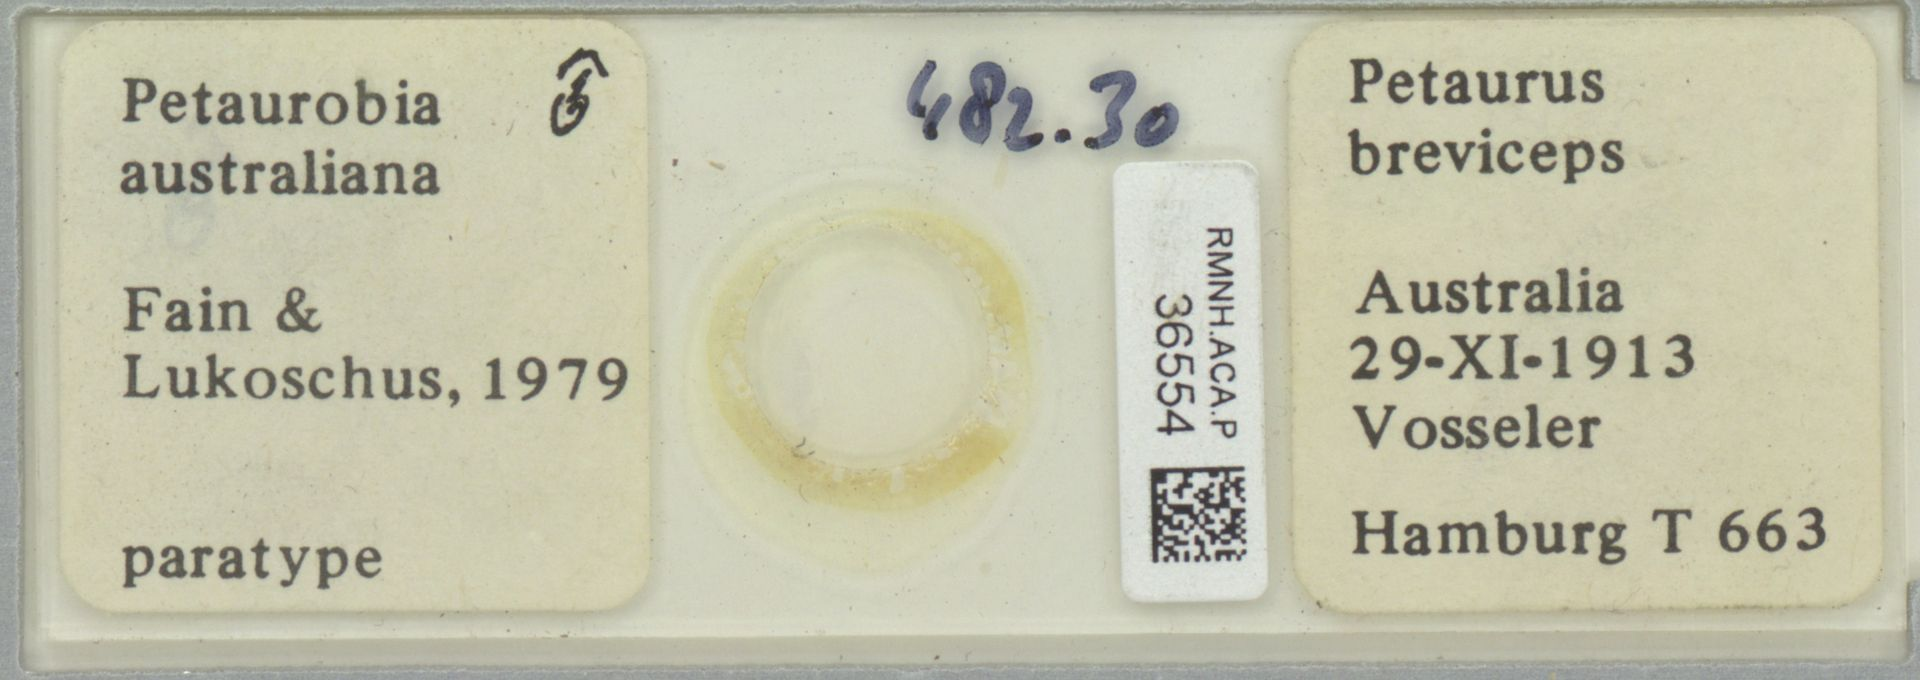 RMNH.ACA.P.36554 | Petaurobia australiana Fain & Lukoschus, 1979